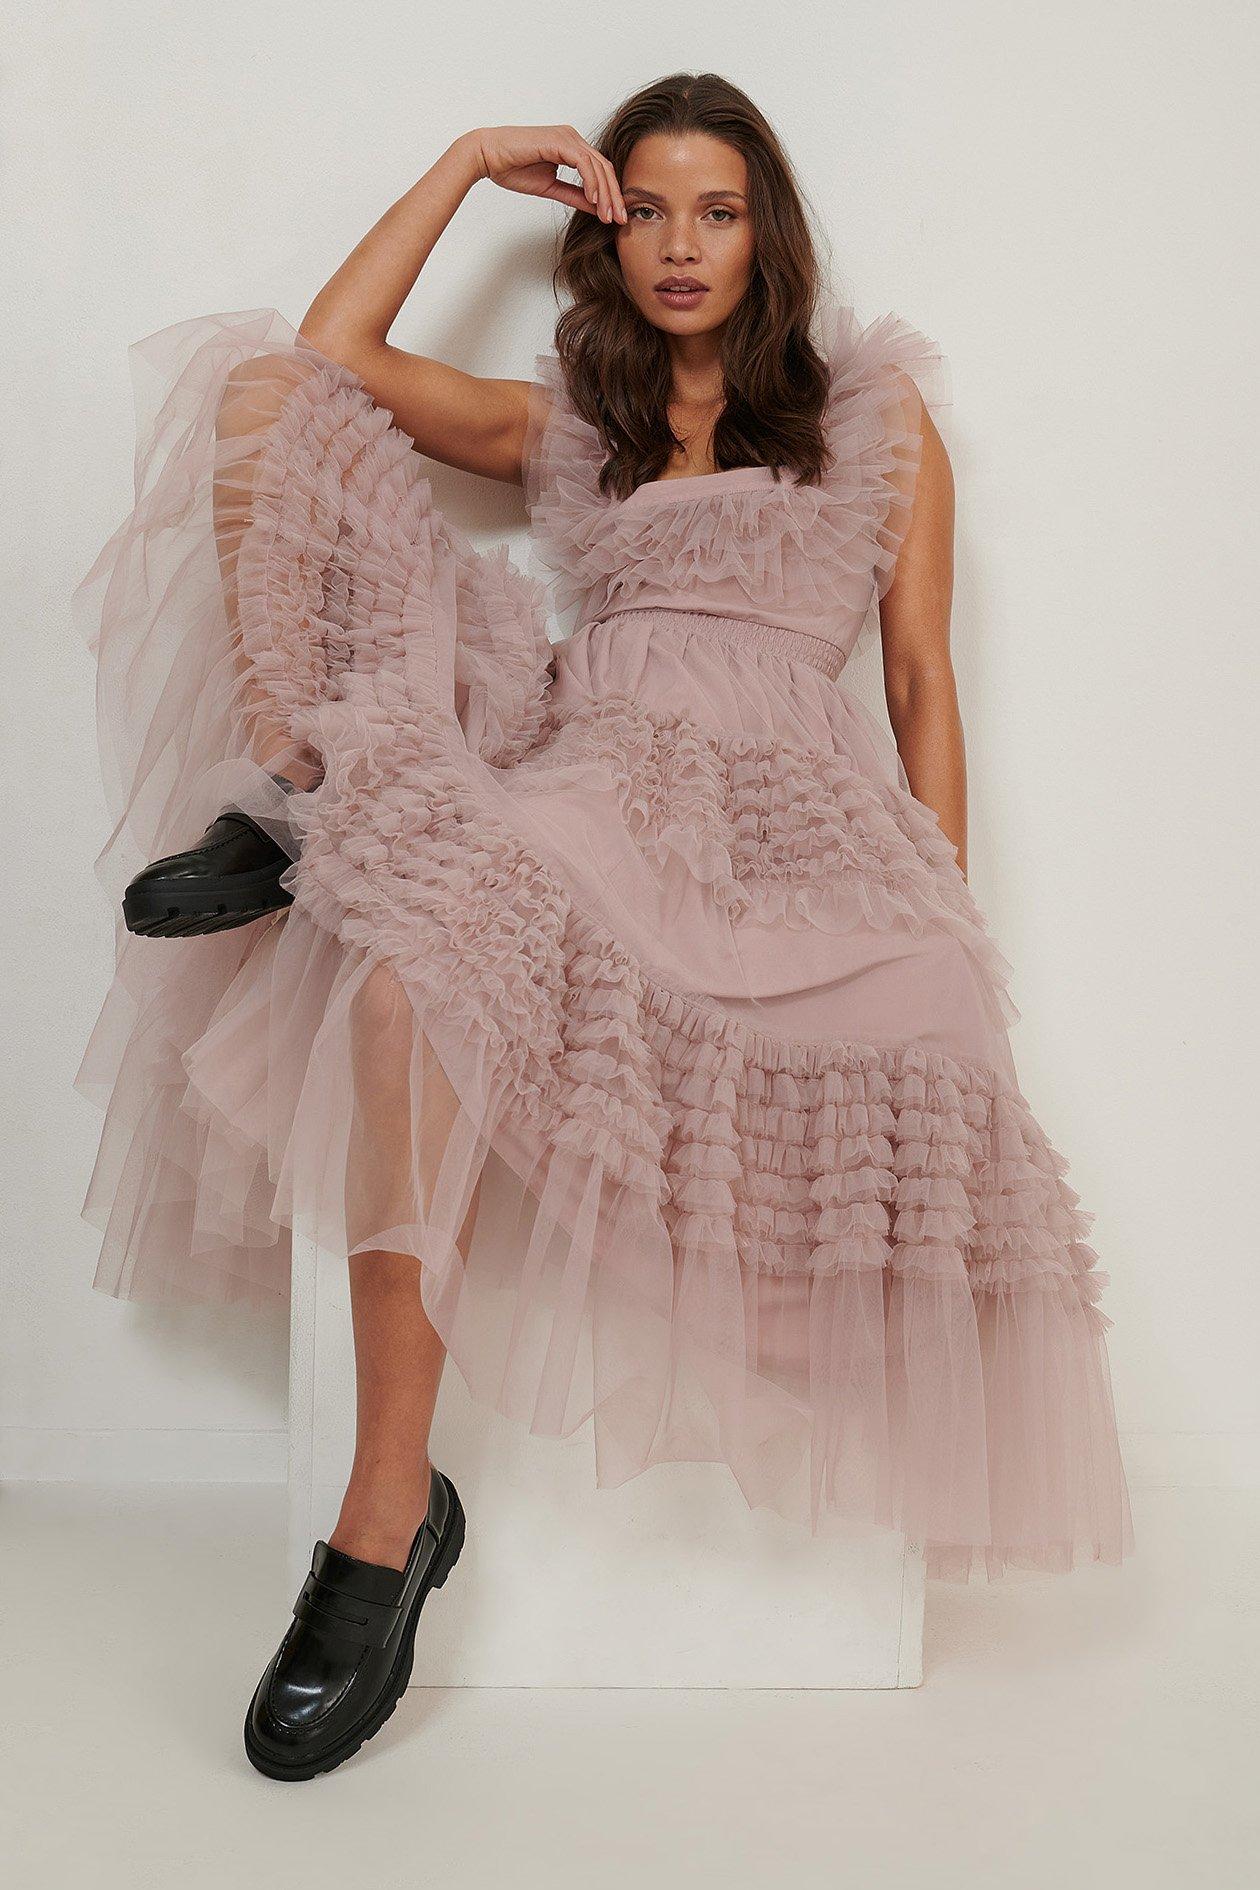 NA-KD ART Tulle Dress - Pink